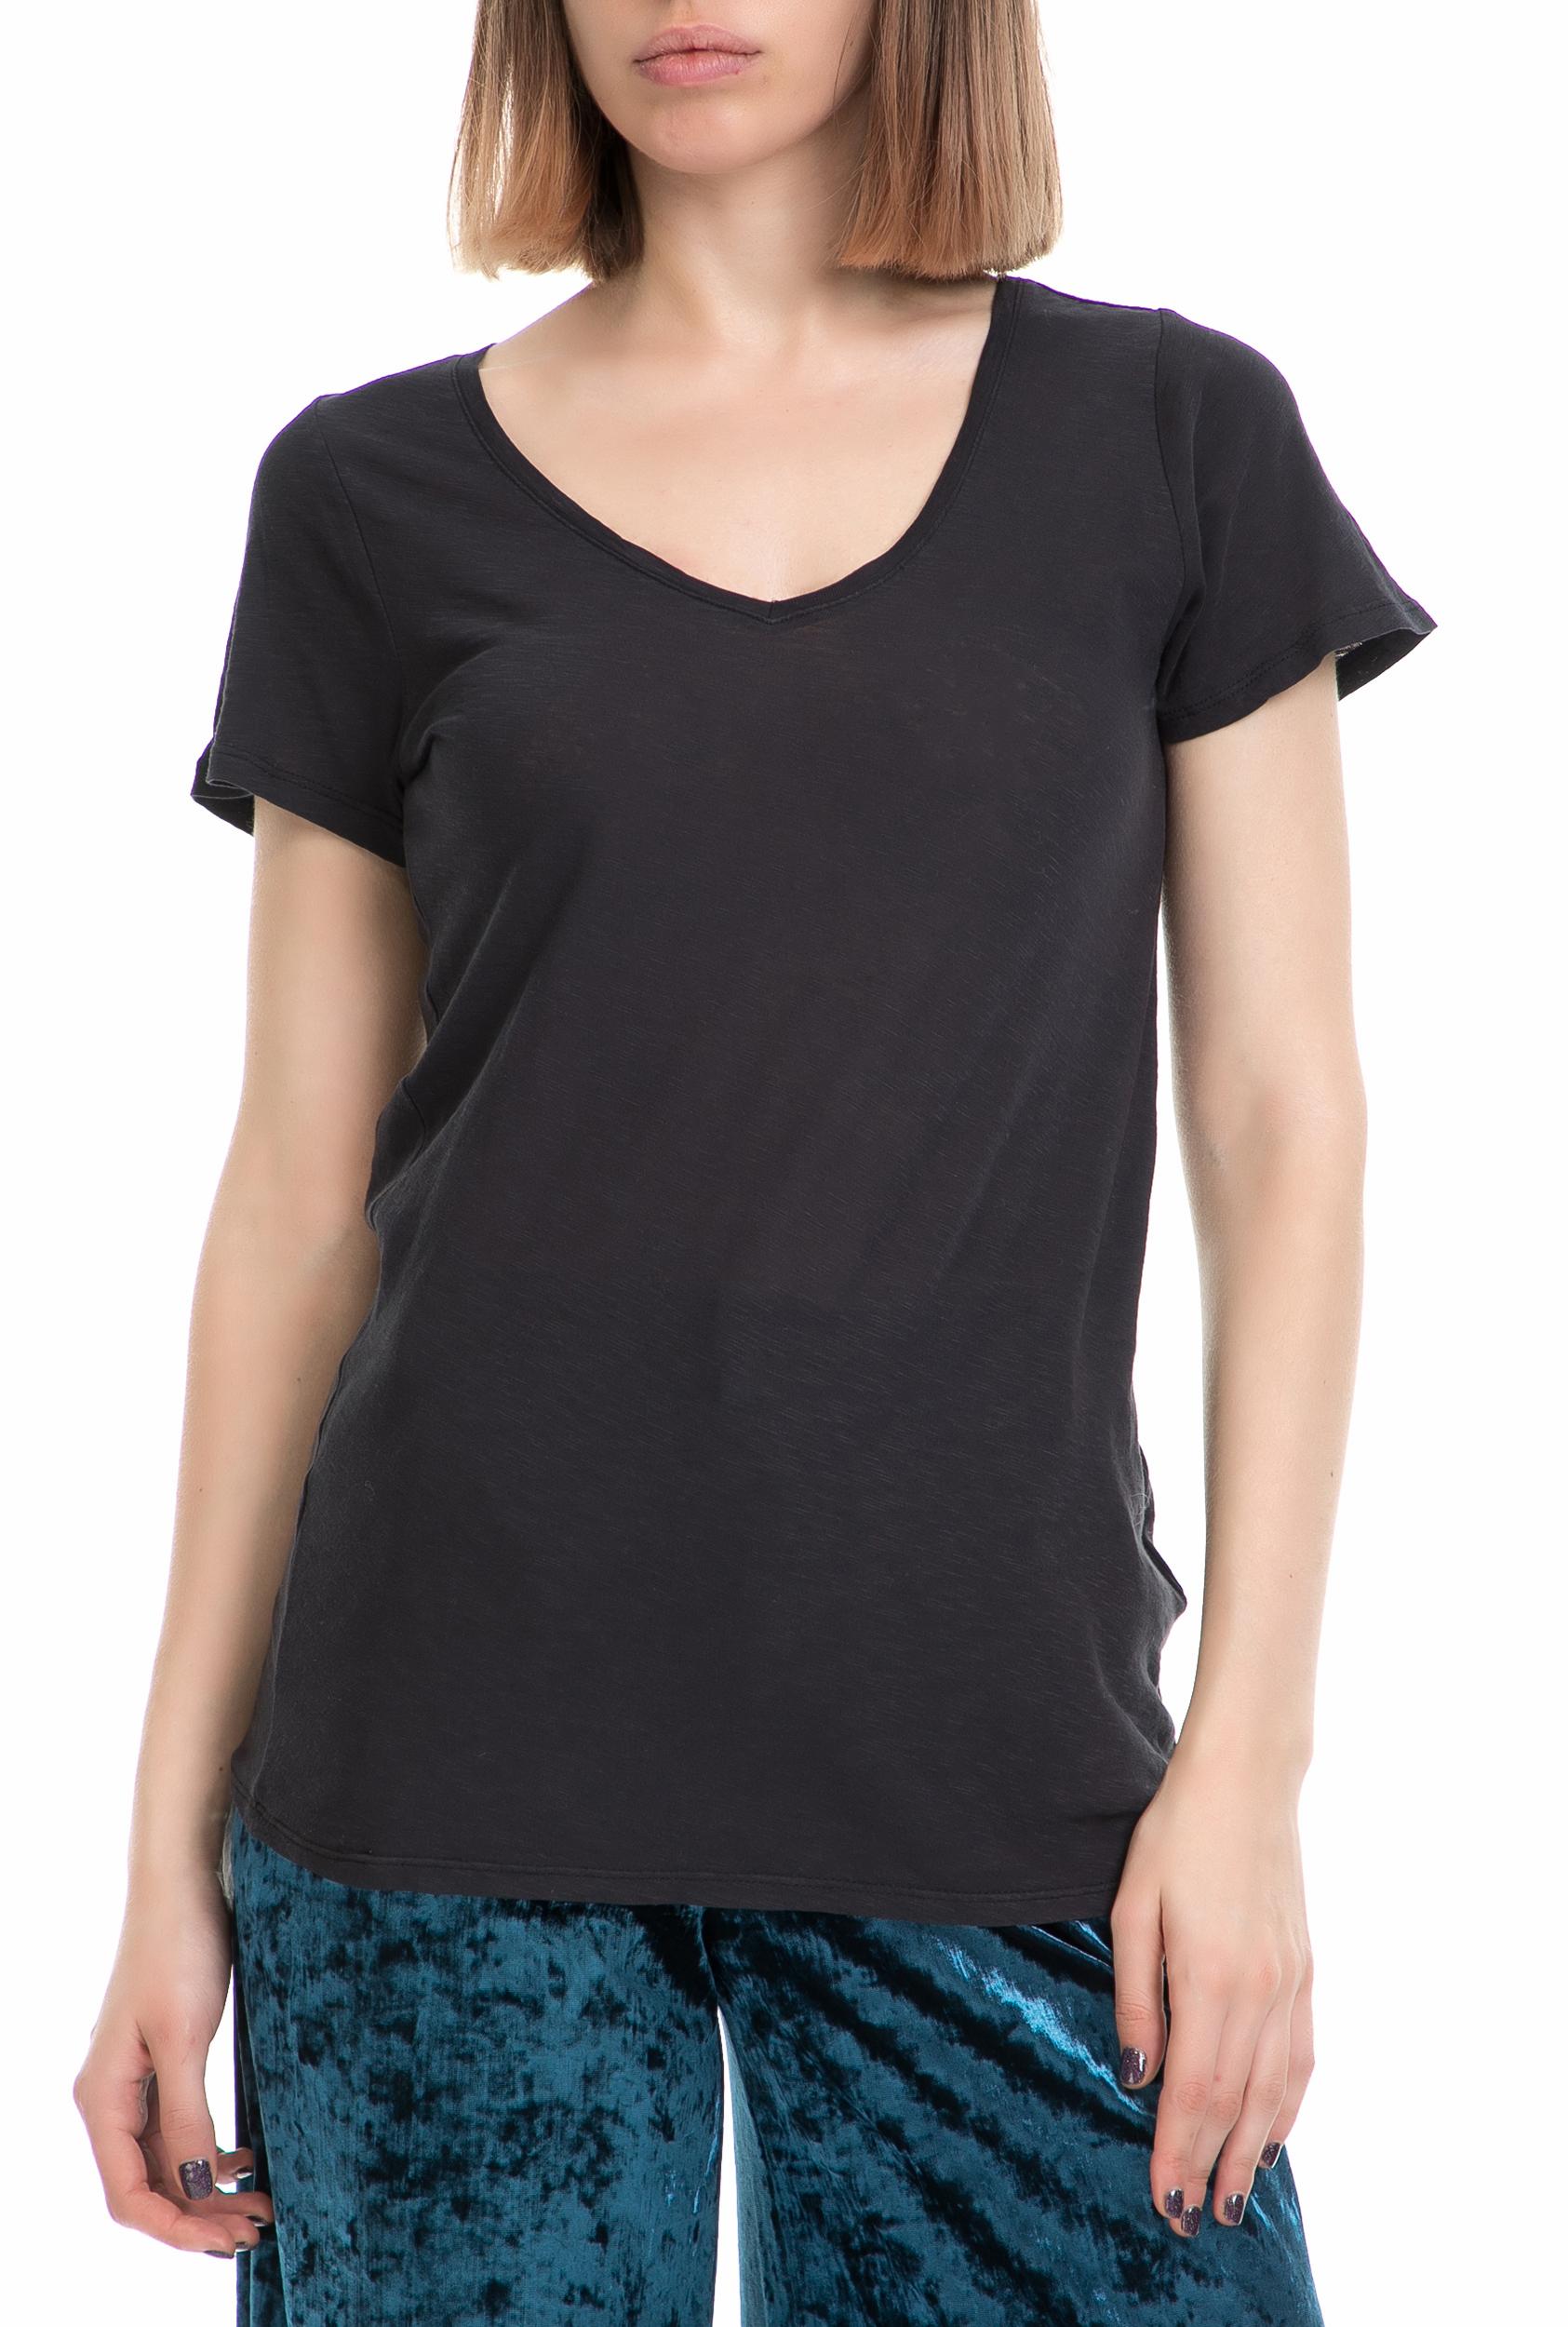 GARCIA JEANS – Γυναικείο T-shirt Donna GARCIA JEANS μαύρο